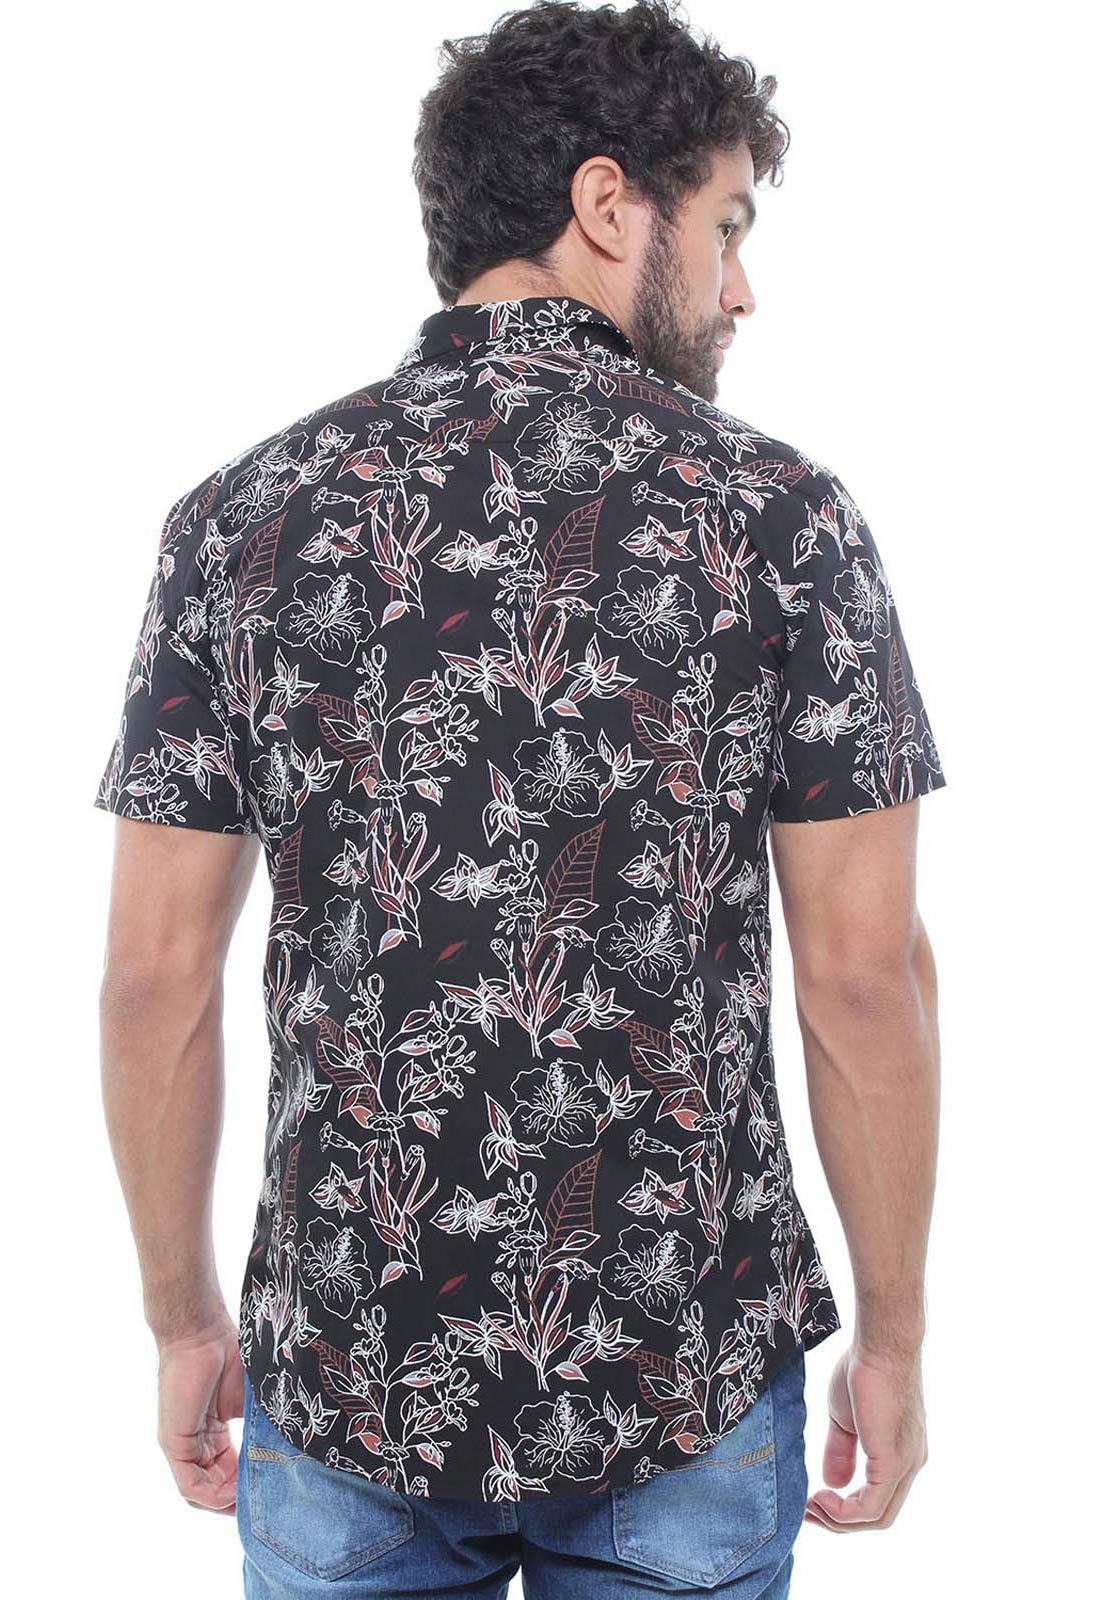 Camisa Estampada Masculina Manga Curta Crocker -  47935  - CROCKER JEANS